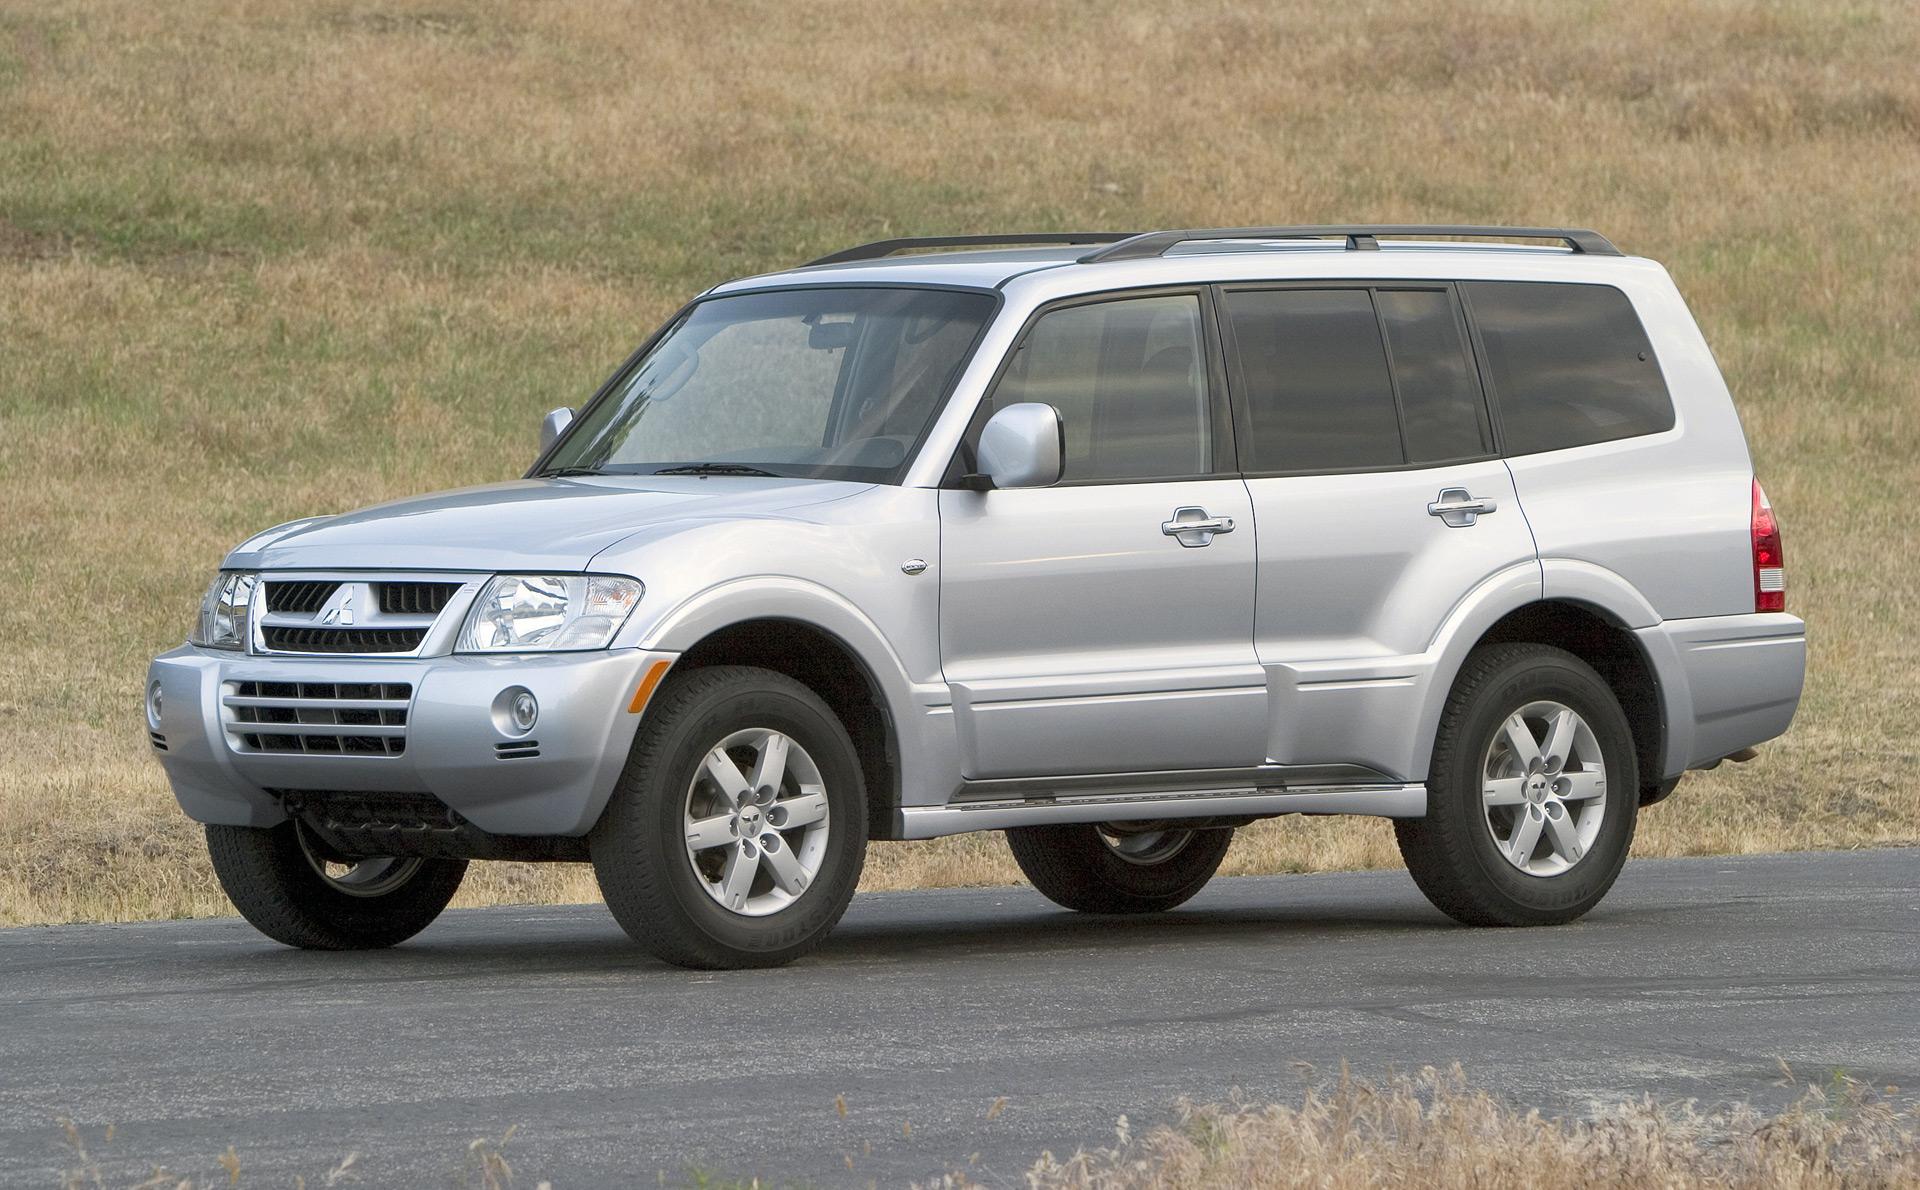 New Mitsubishi Montero Could Be Developed Alongside Next Nissan Armada